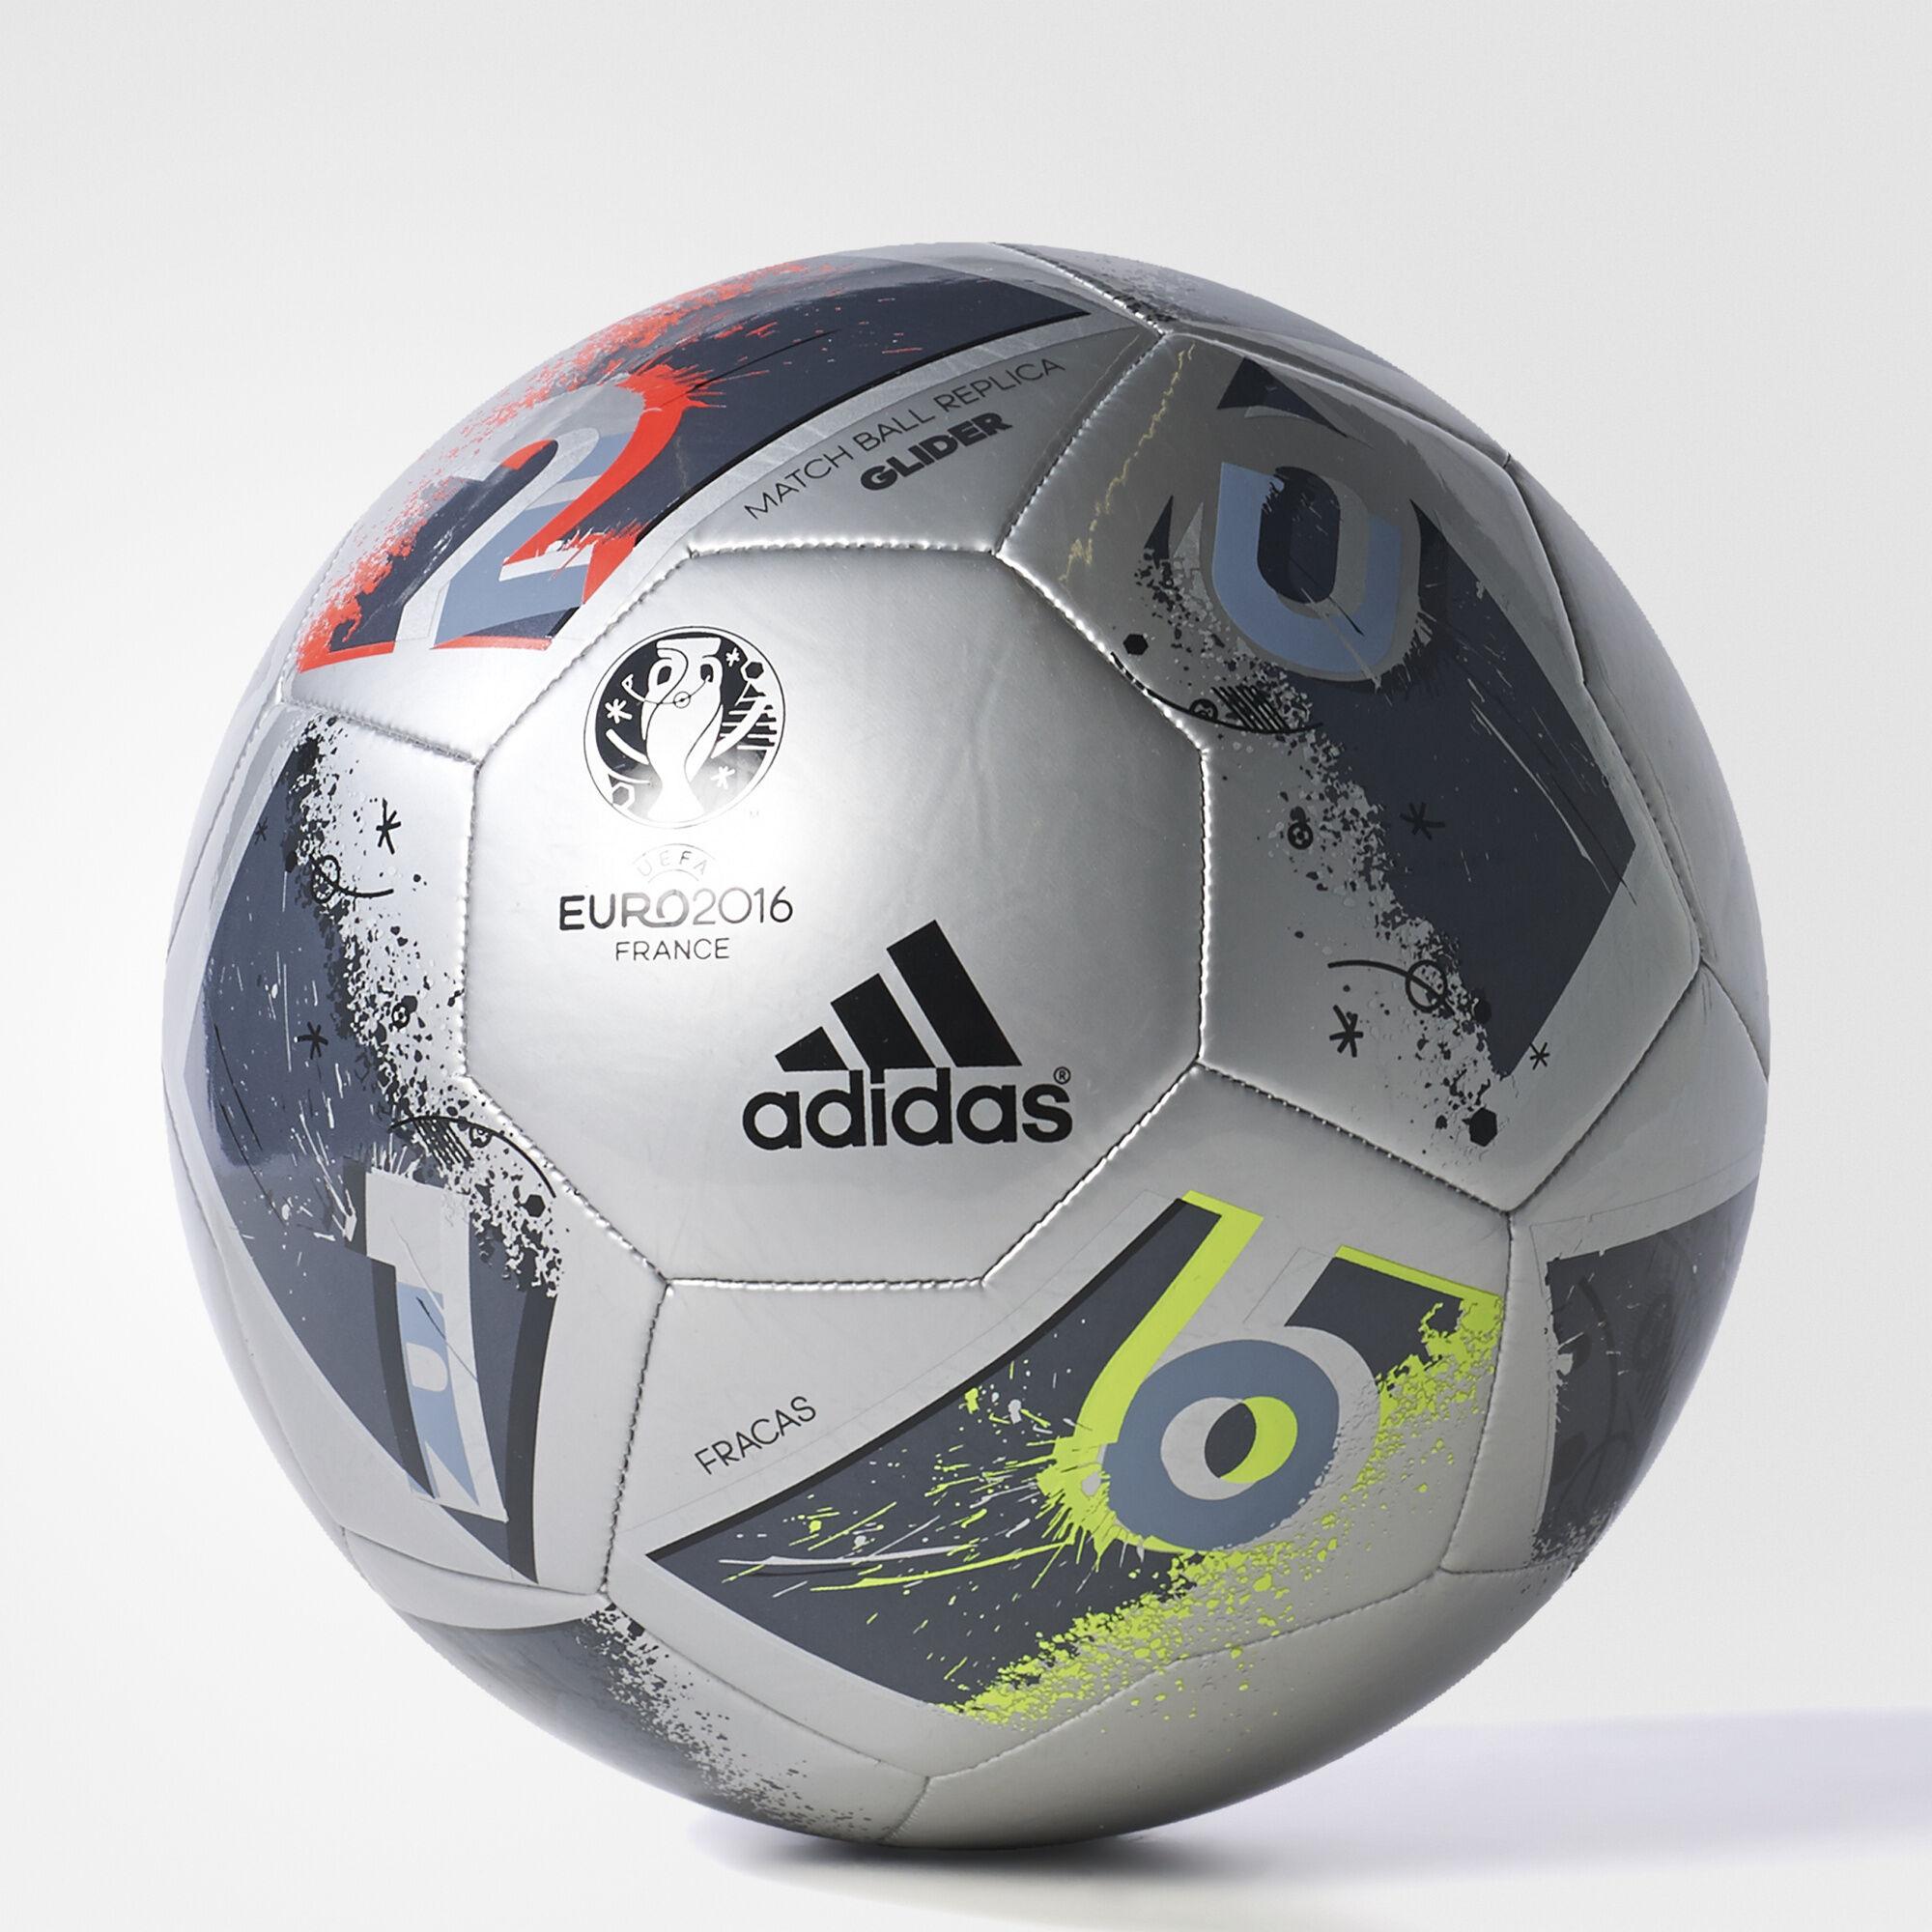 Fútbol Mi Gran Pasión   Balon Adidas 467bb40c9c71d